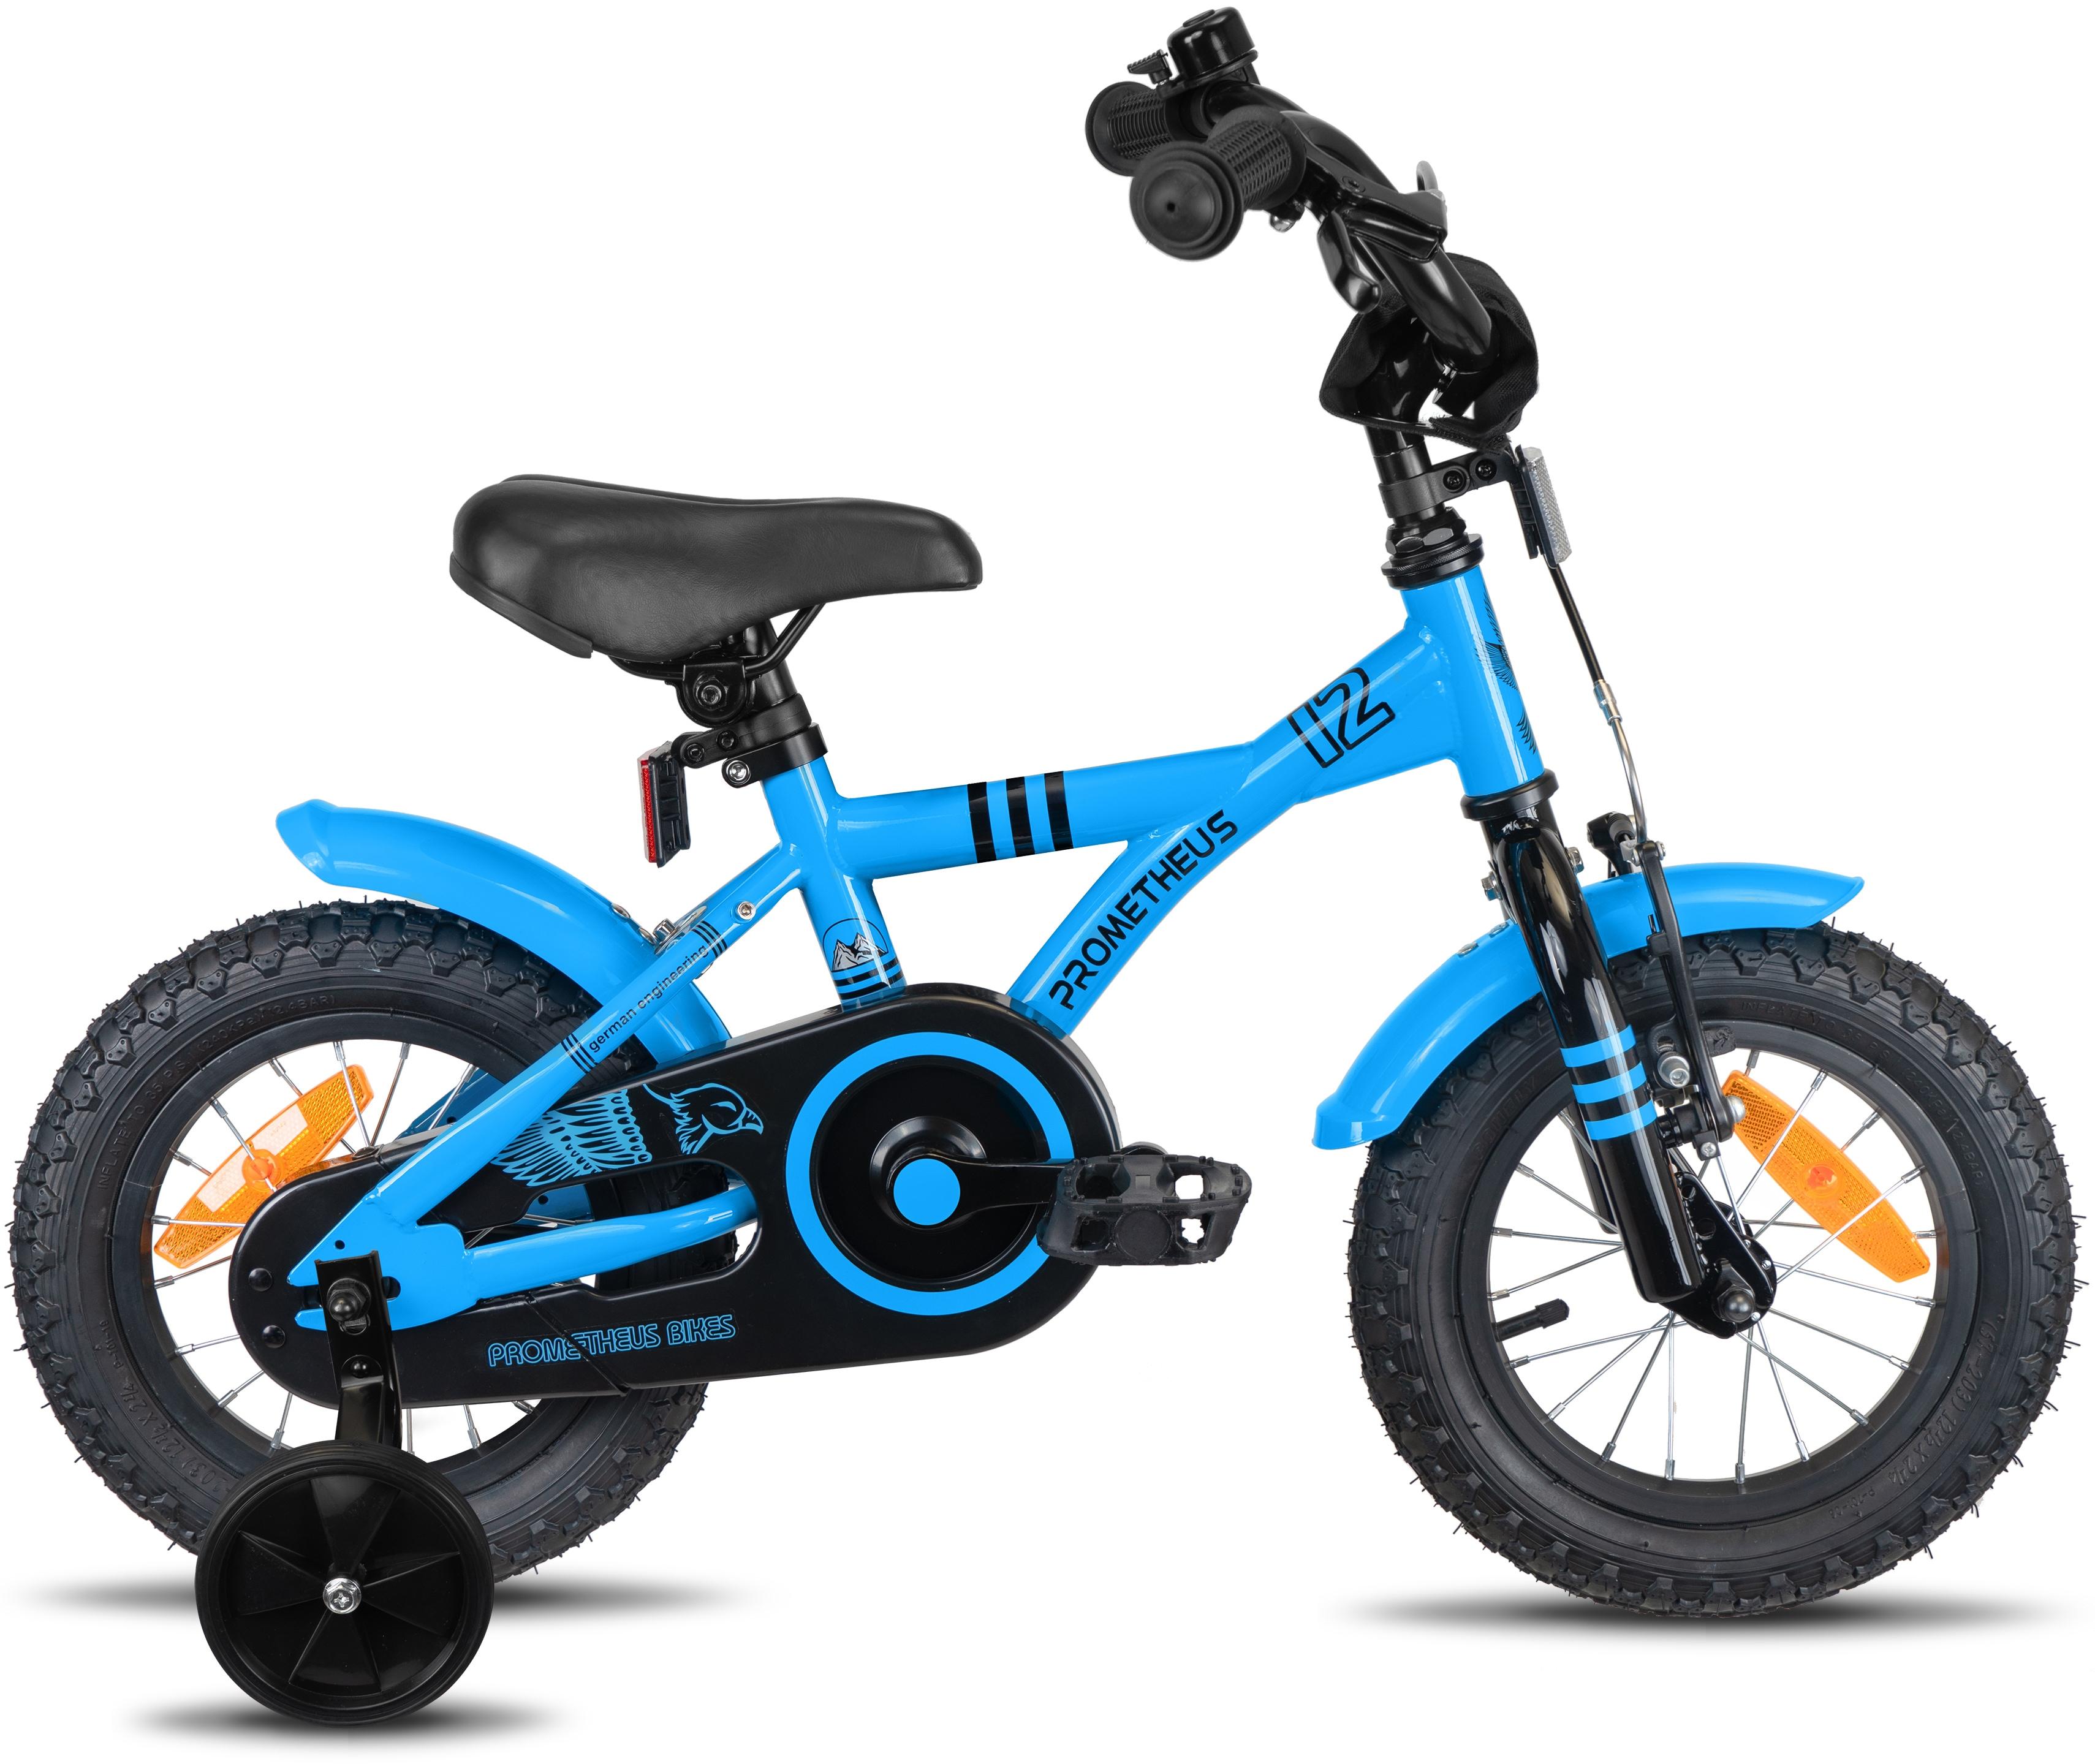 PROMETHEUS BICYCLES Kinderfahrrad Hawk, 1 Gang blau Kinder Kinderfahrräder Fahrräder Zubehör Fahrrad